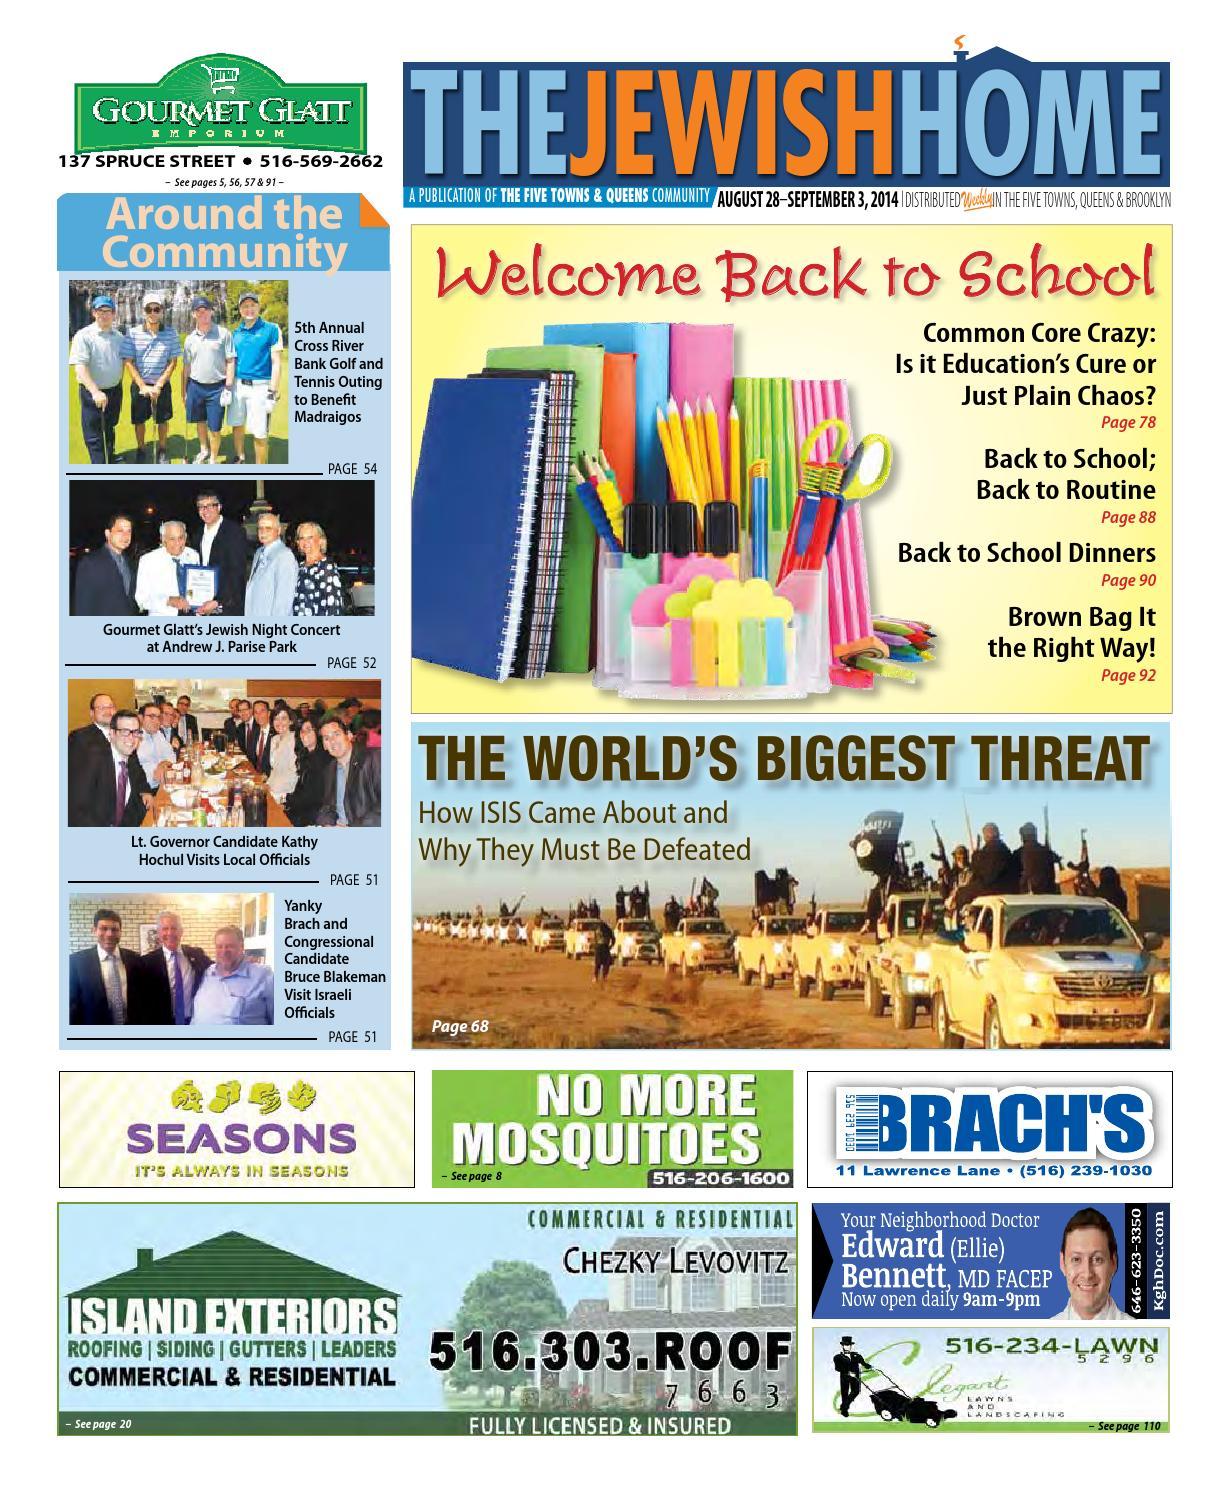 Five Towns Jewish Home 8-28-14 by Yitzy Halpern - issuu